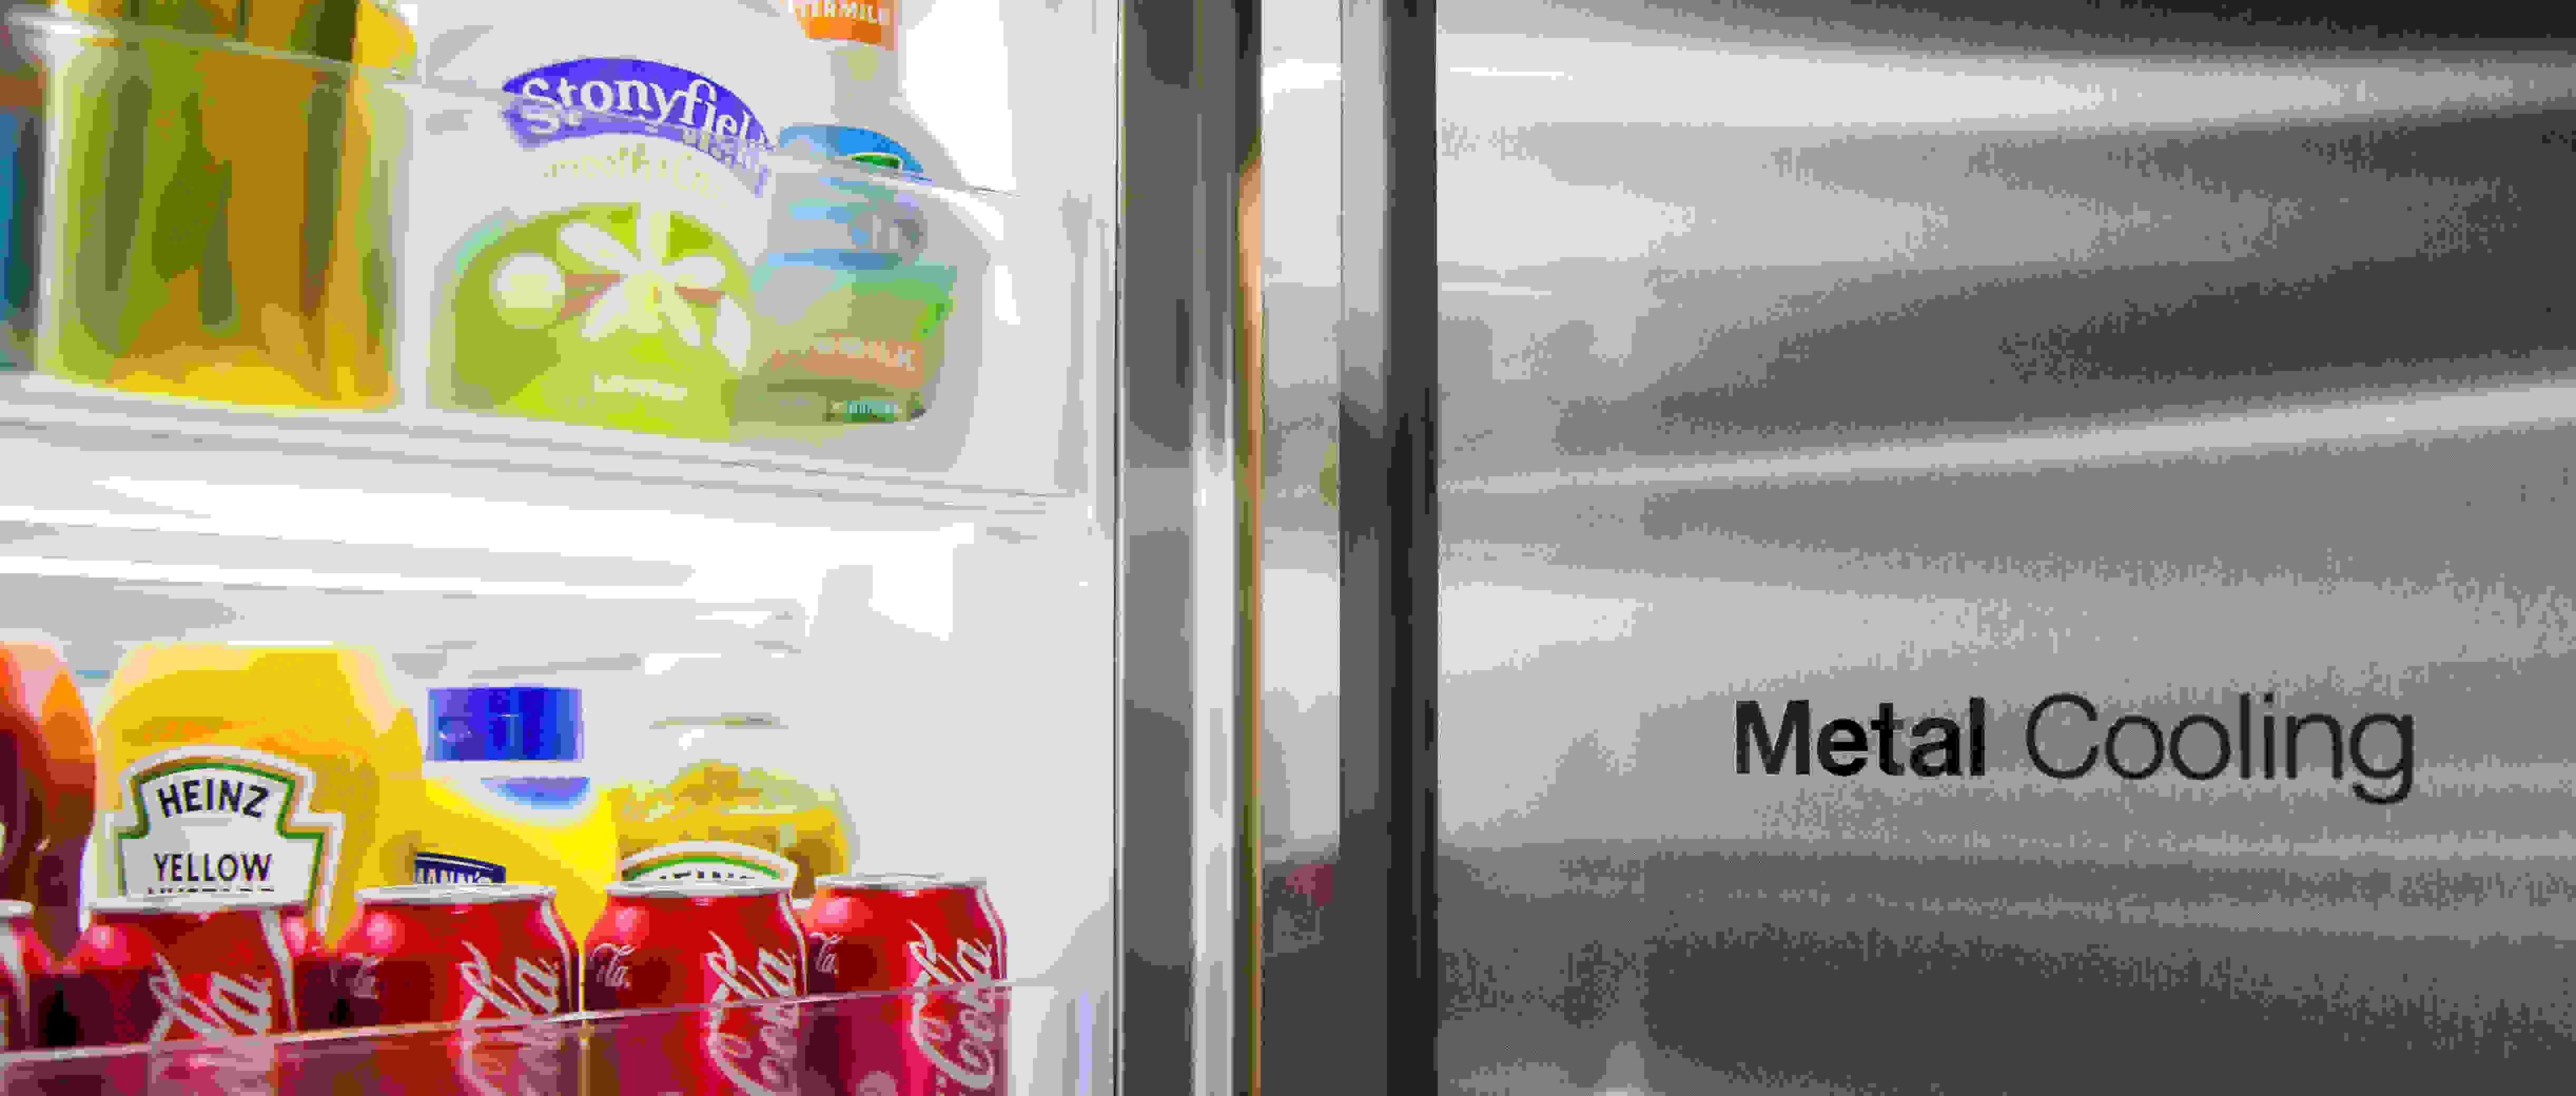 Samsung RH29H9000SR Food Showcase Door in Door Side by Side Refrigerator